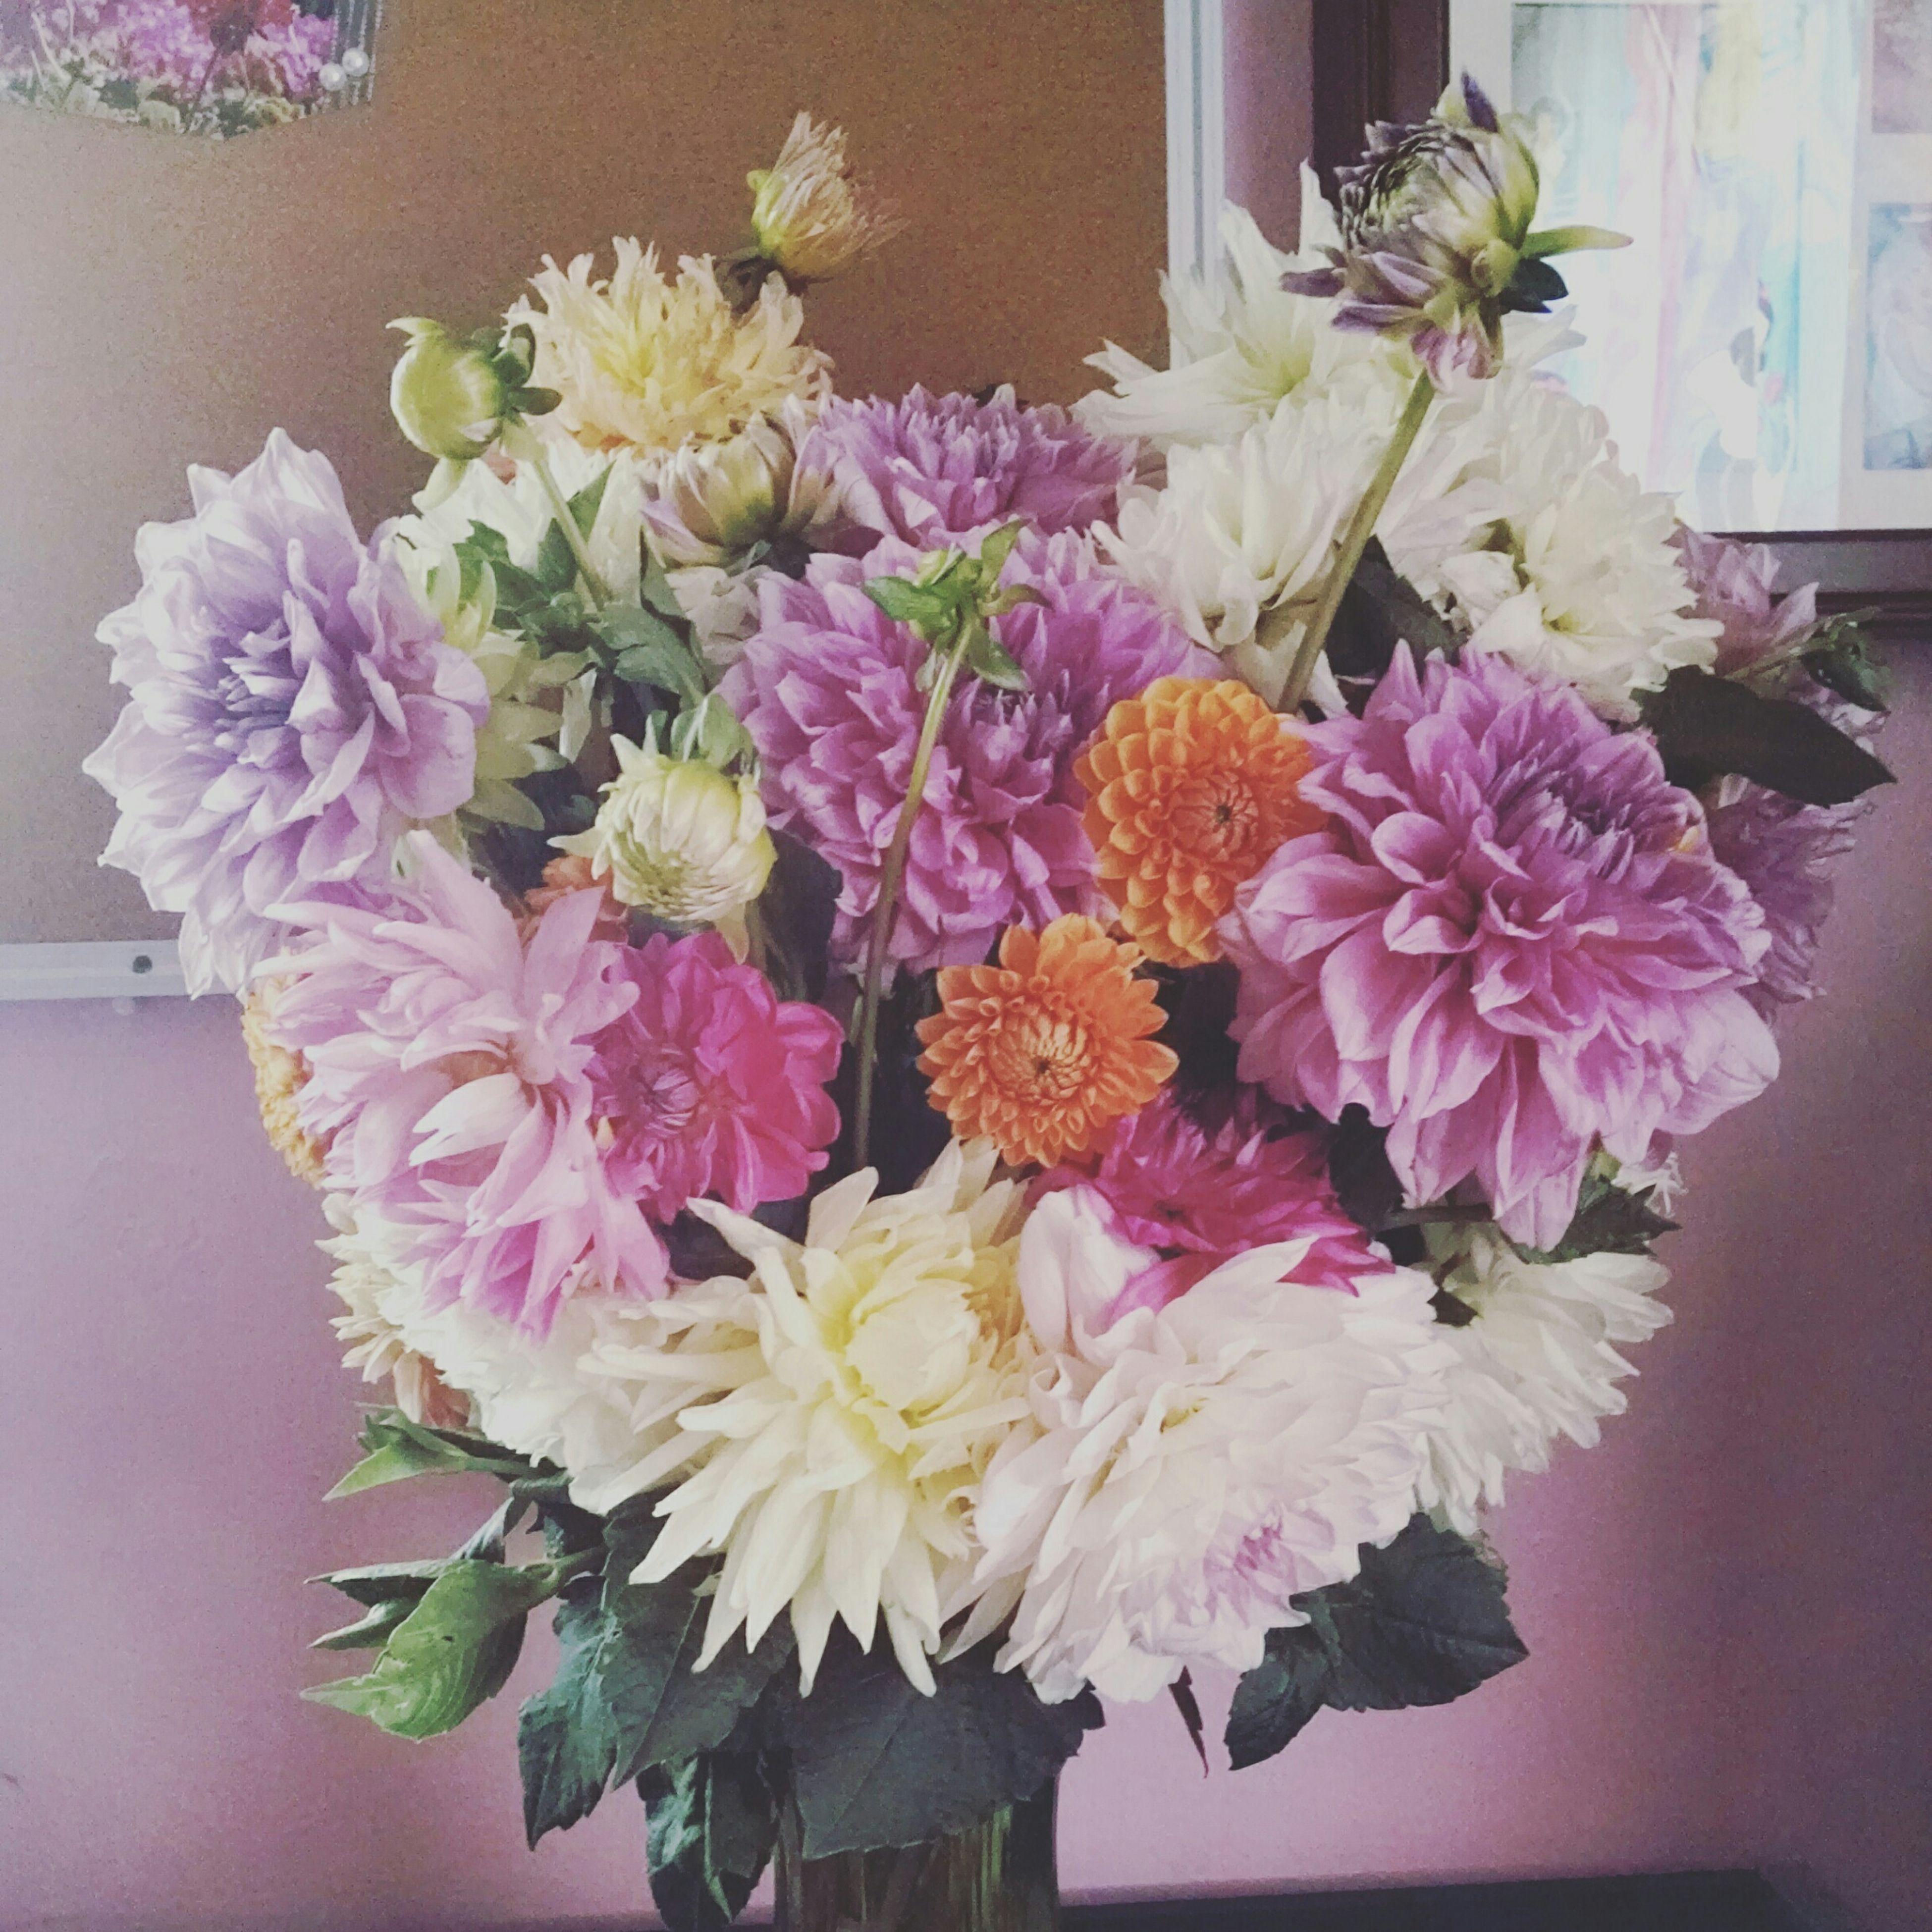 flower, freshness, indoors, fragility, petal, vase, flower head, bunch of flowers, potted plant, growth, flower arrangement, beauty in nature, plant, bouquet, nature, home interior, decoration, leaf, close-up, flower pot